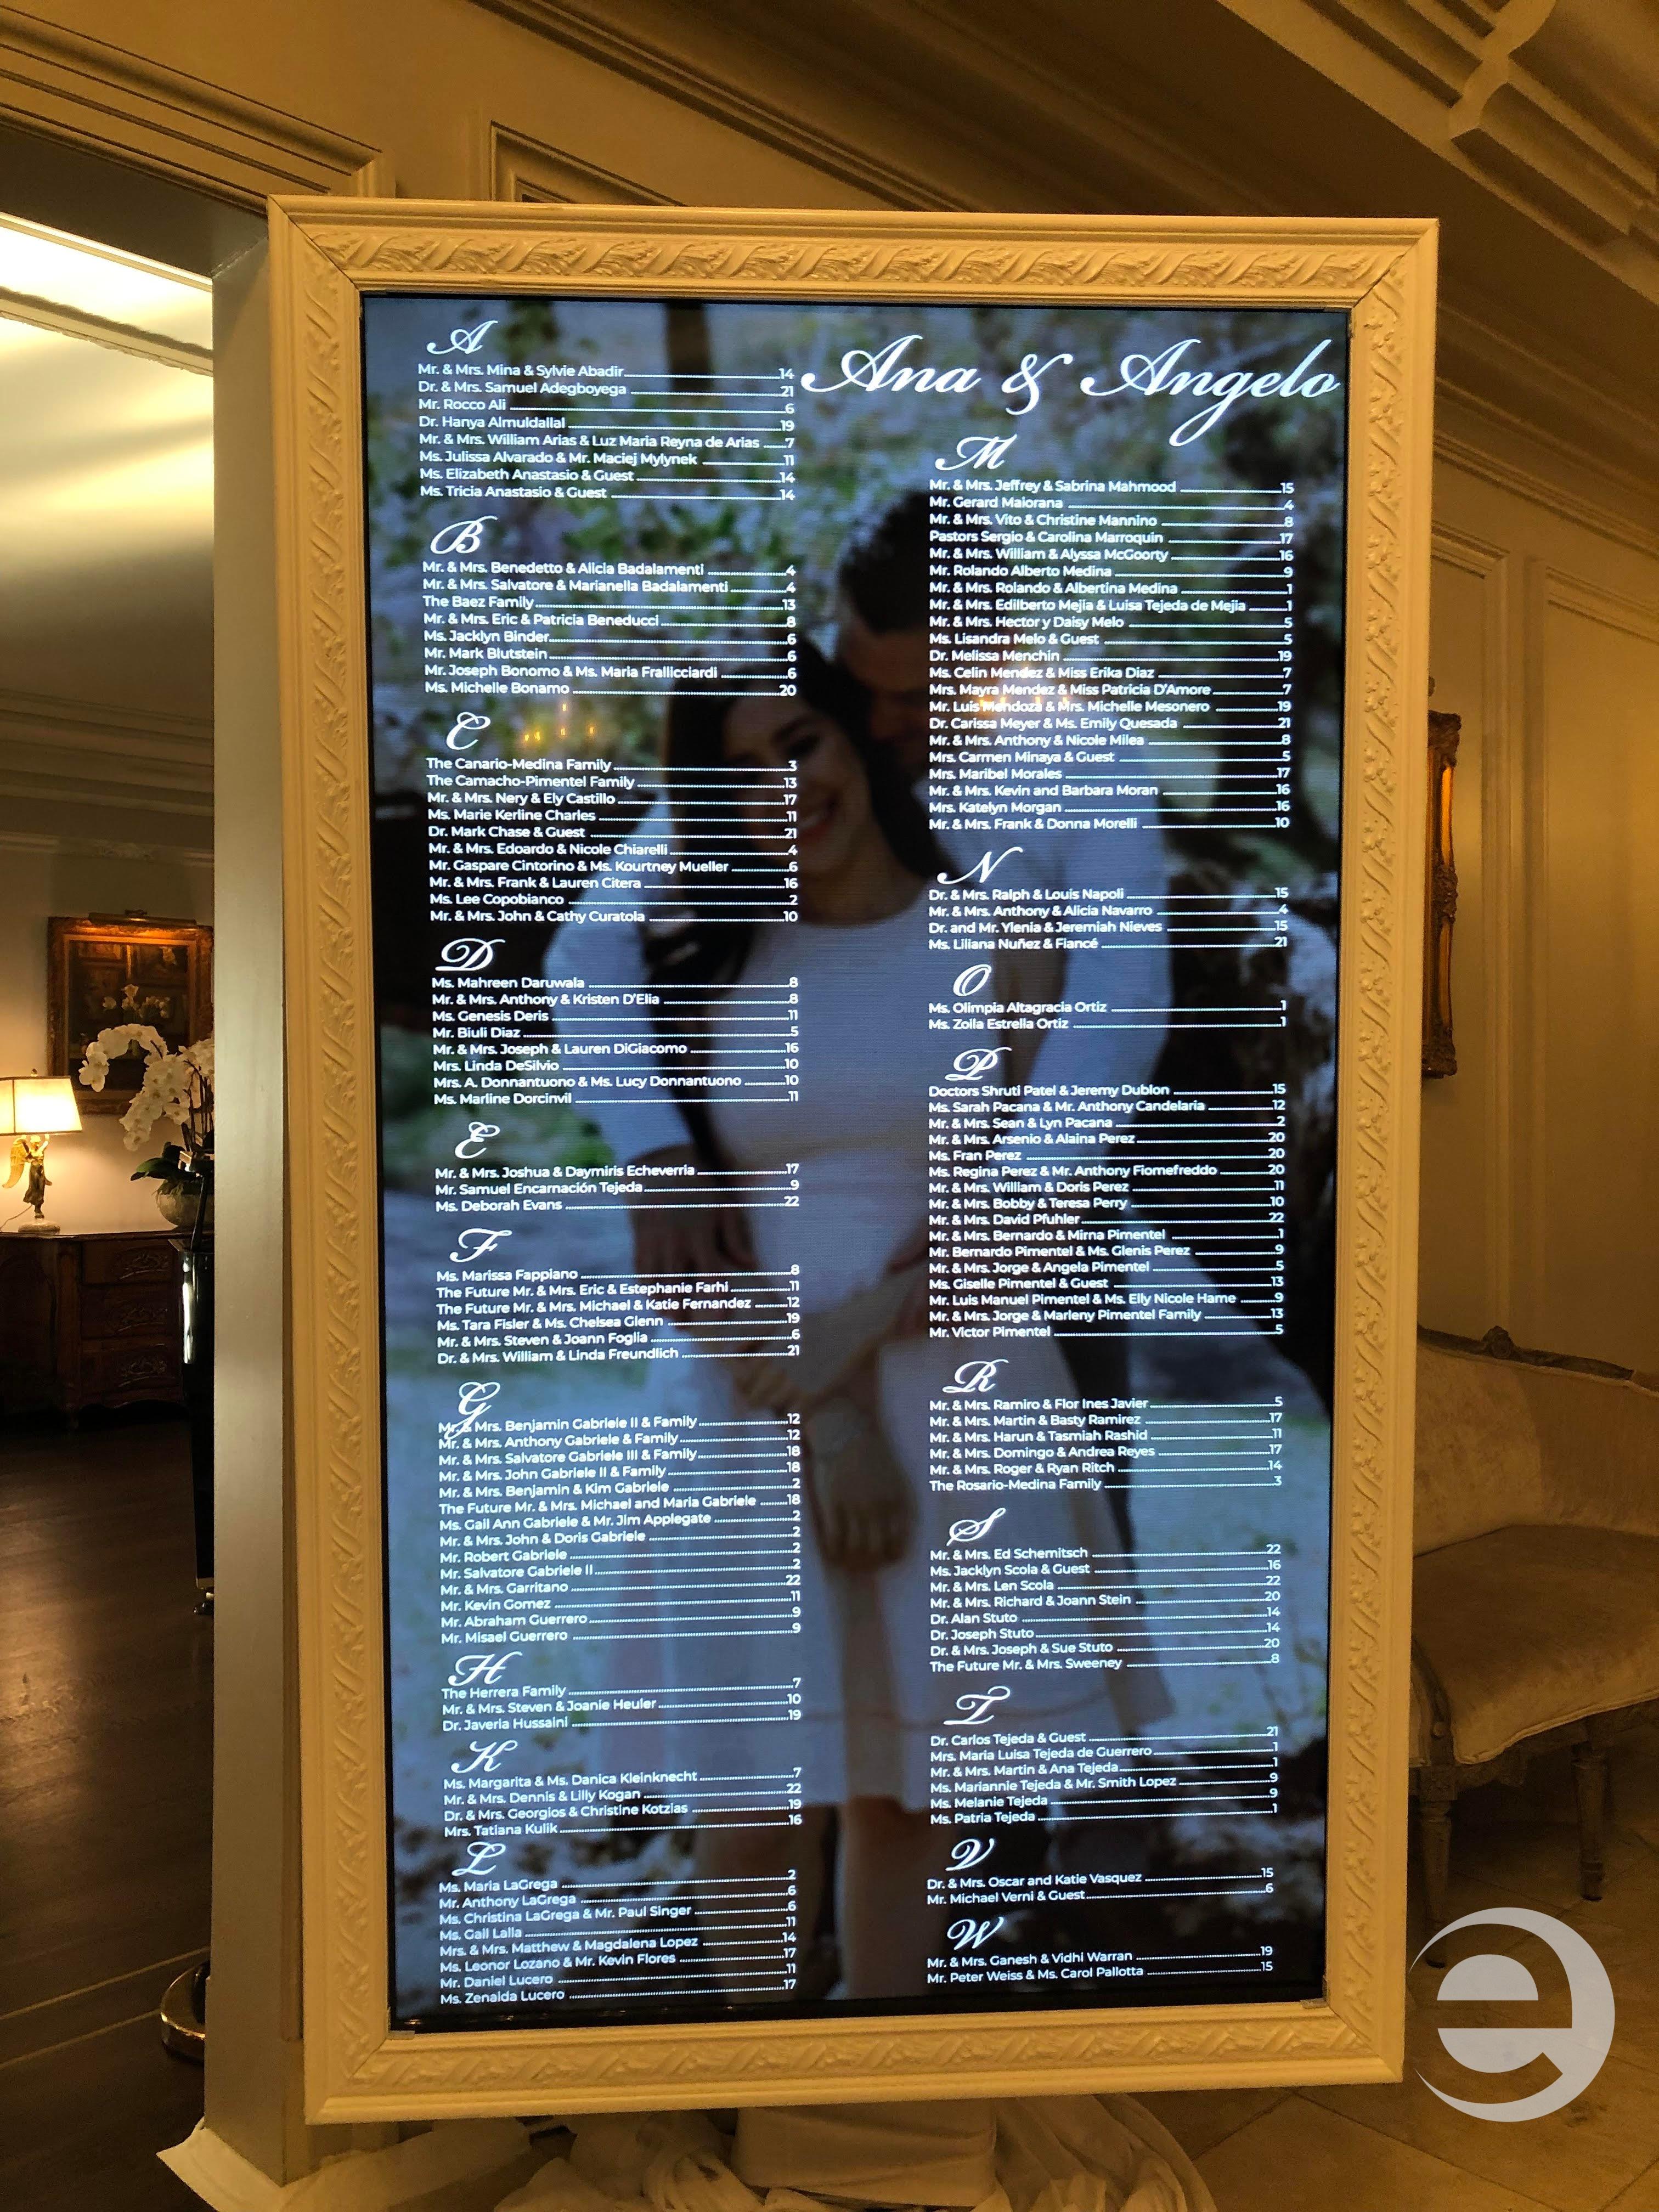 Digital seating chart display for wedding at Park Chateau, NJ